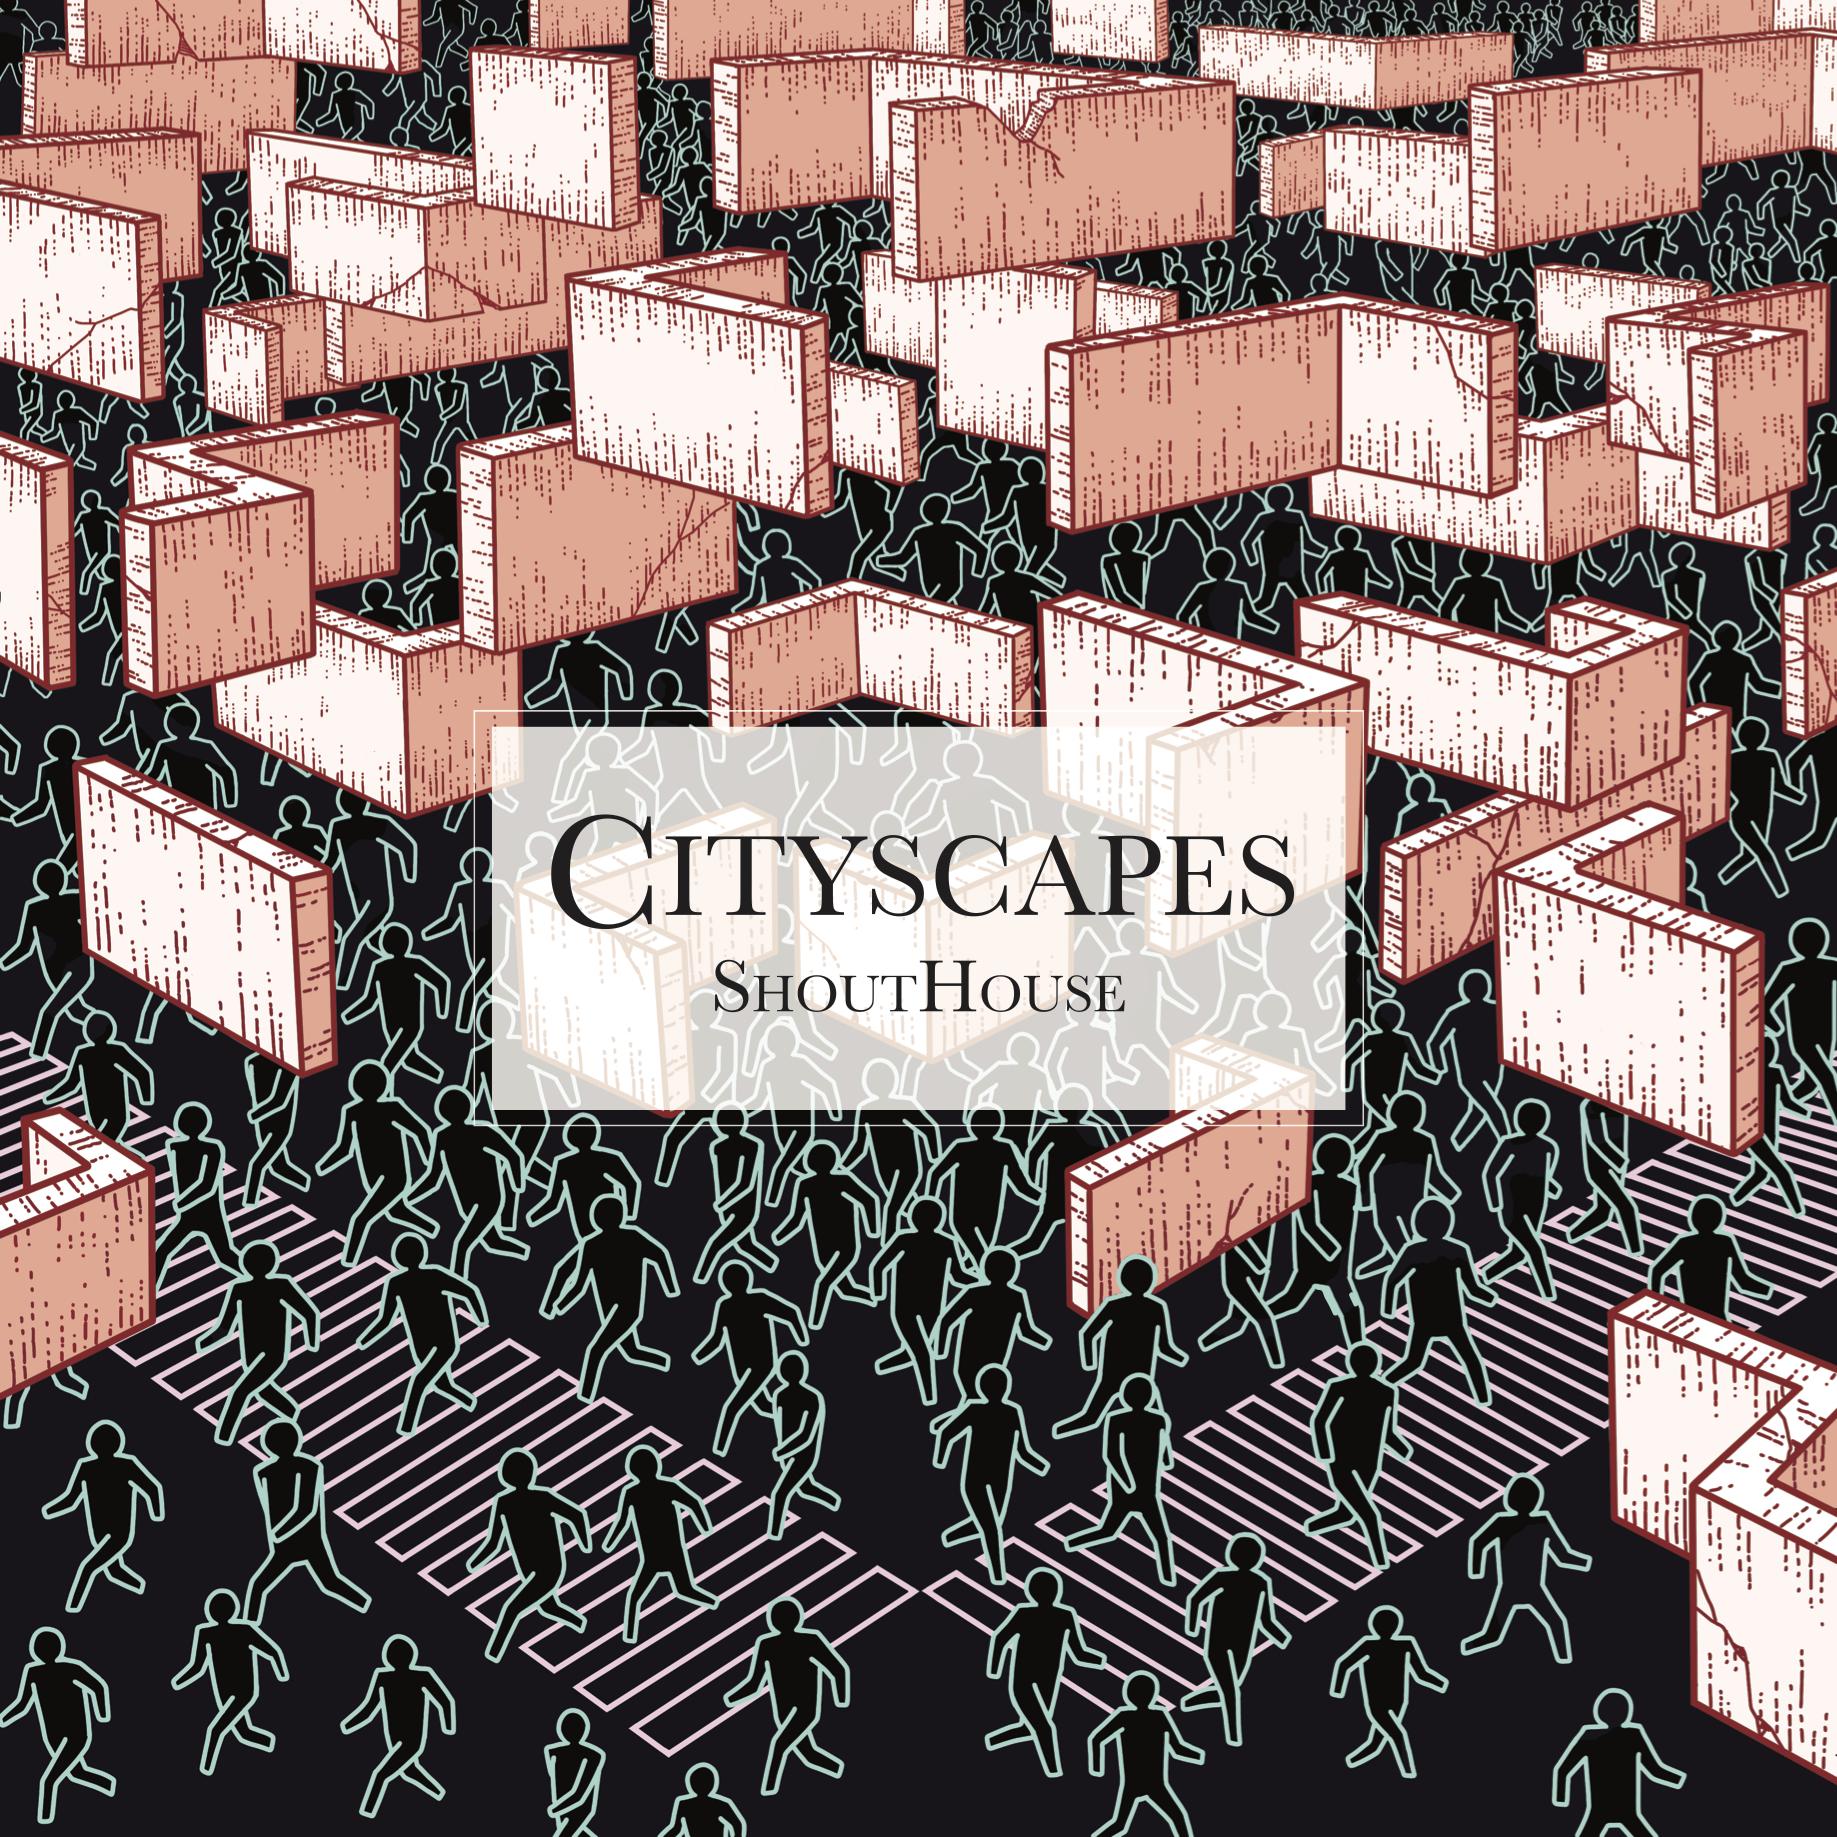 CityScapes - LP Artwork.jpg